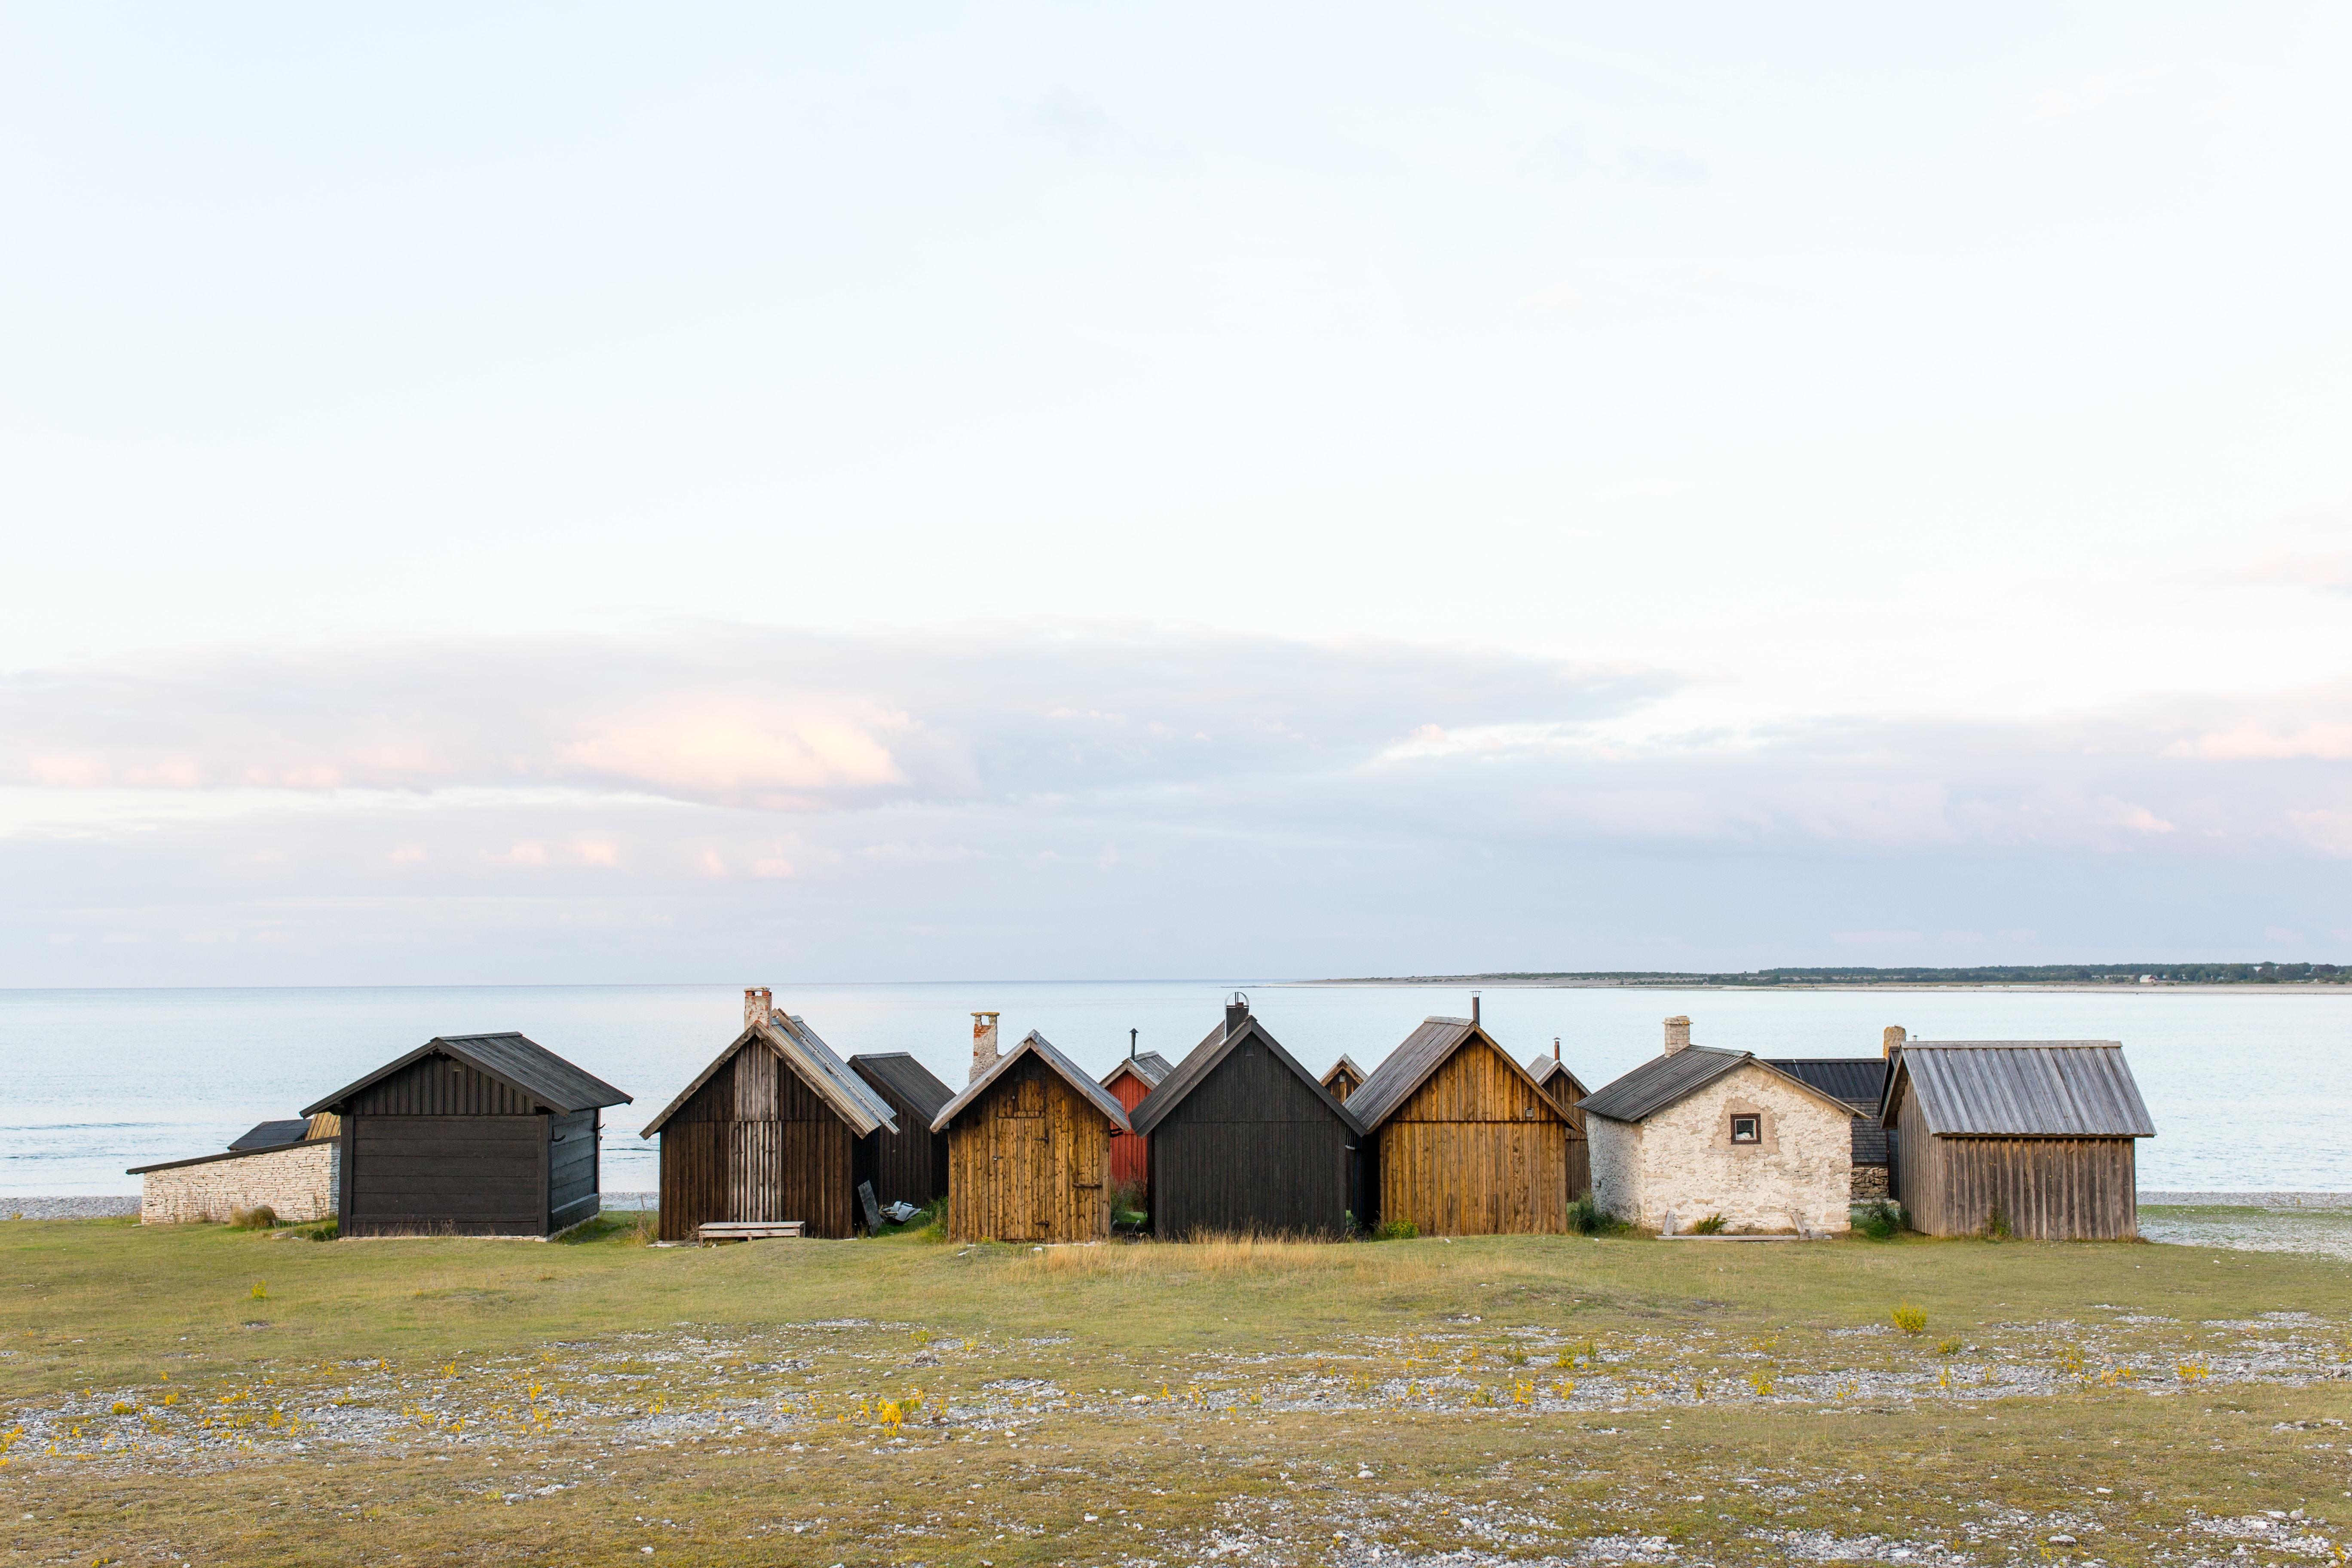 landscape photography of shacks near body of water